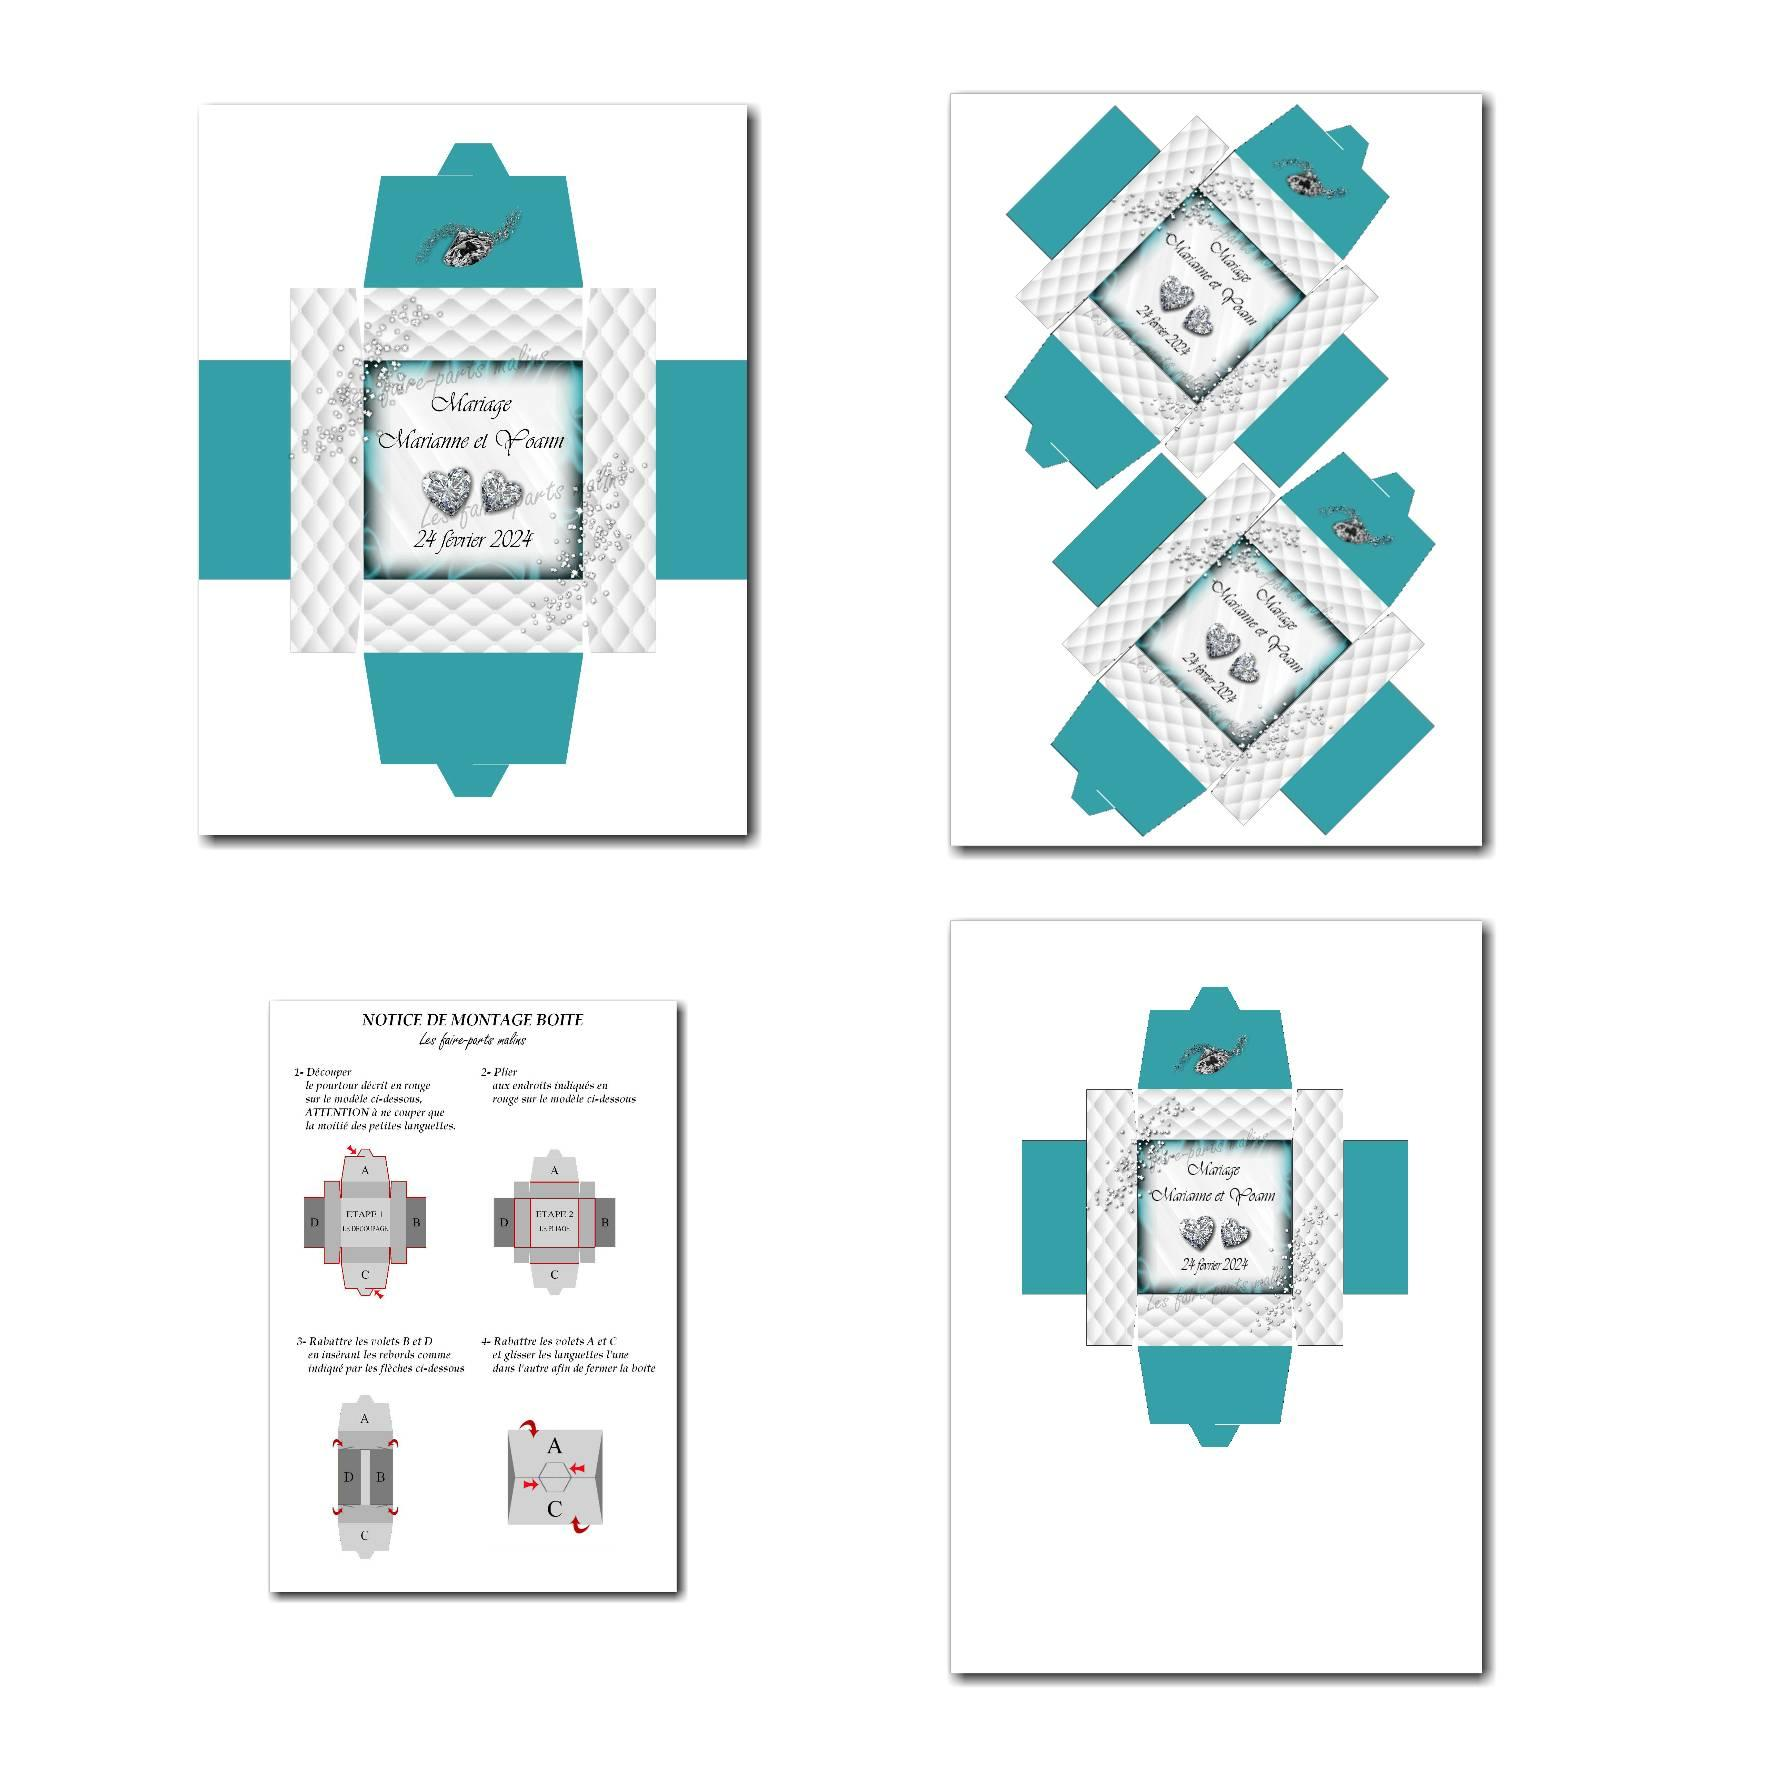 Boite à imprimer avec petits diamants en bleu